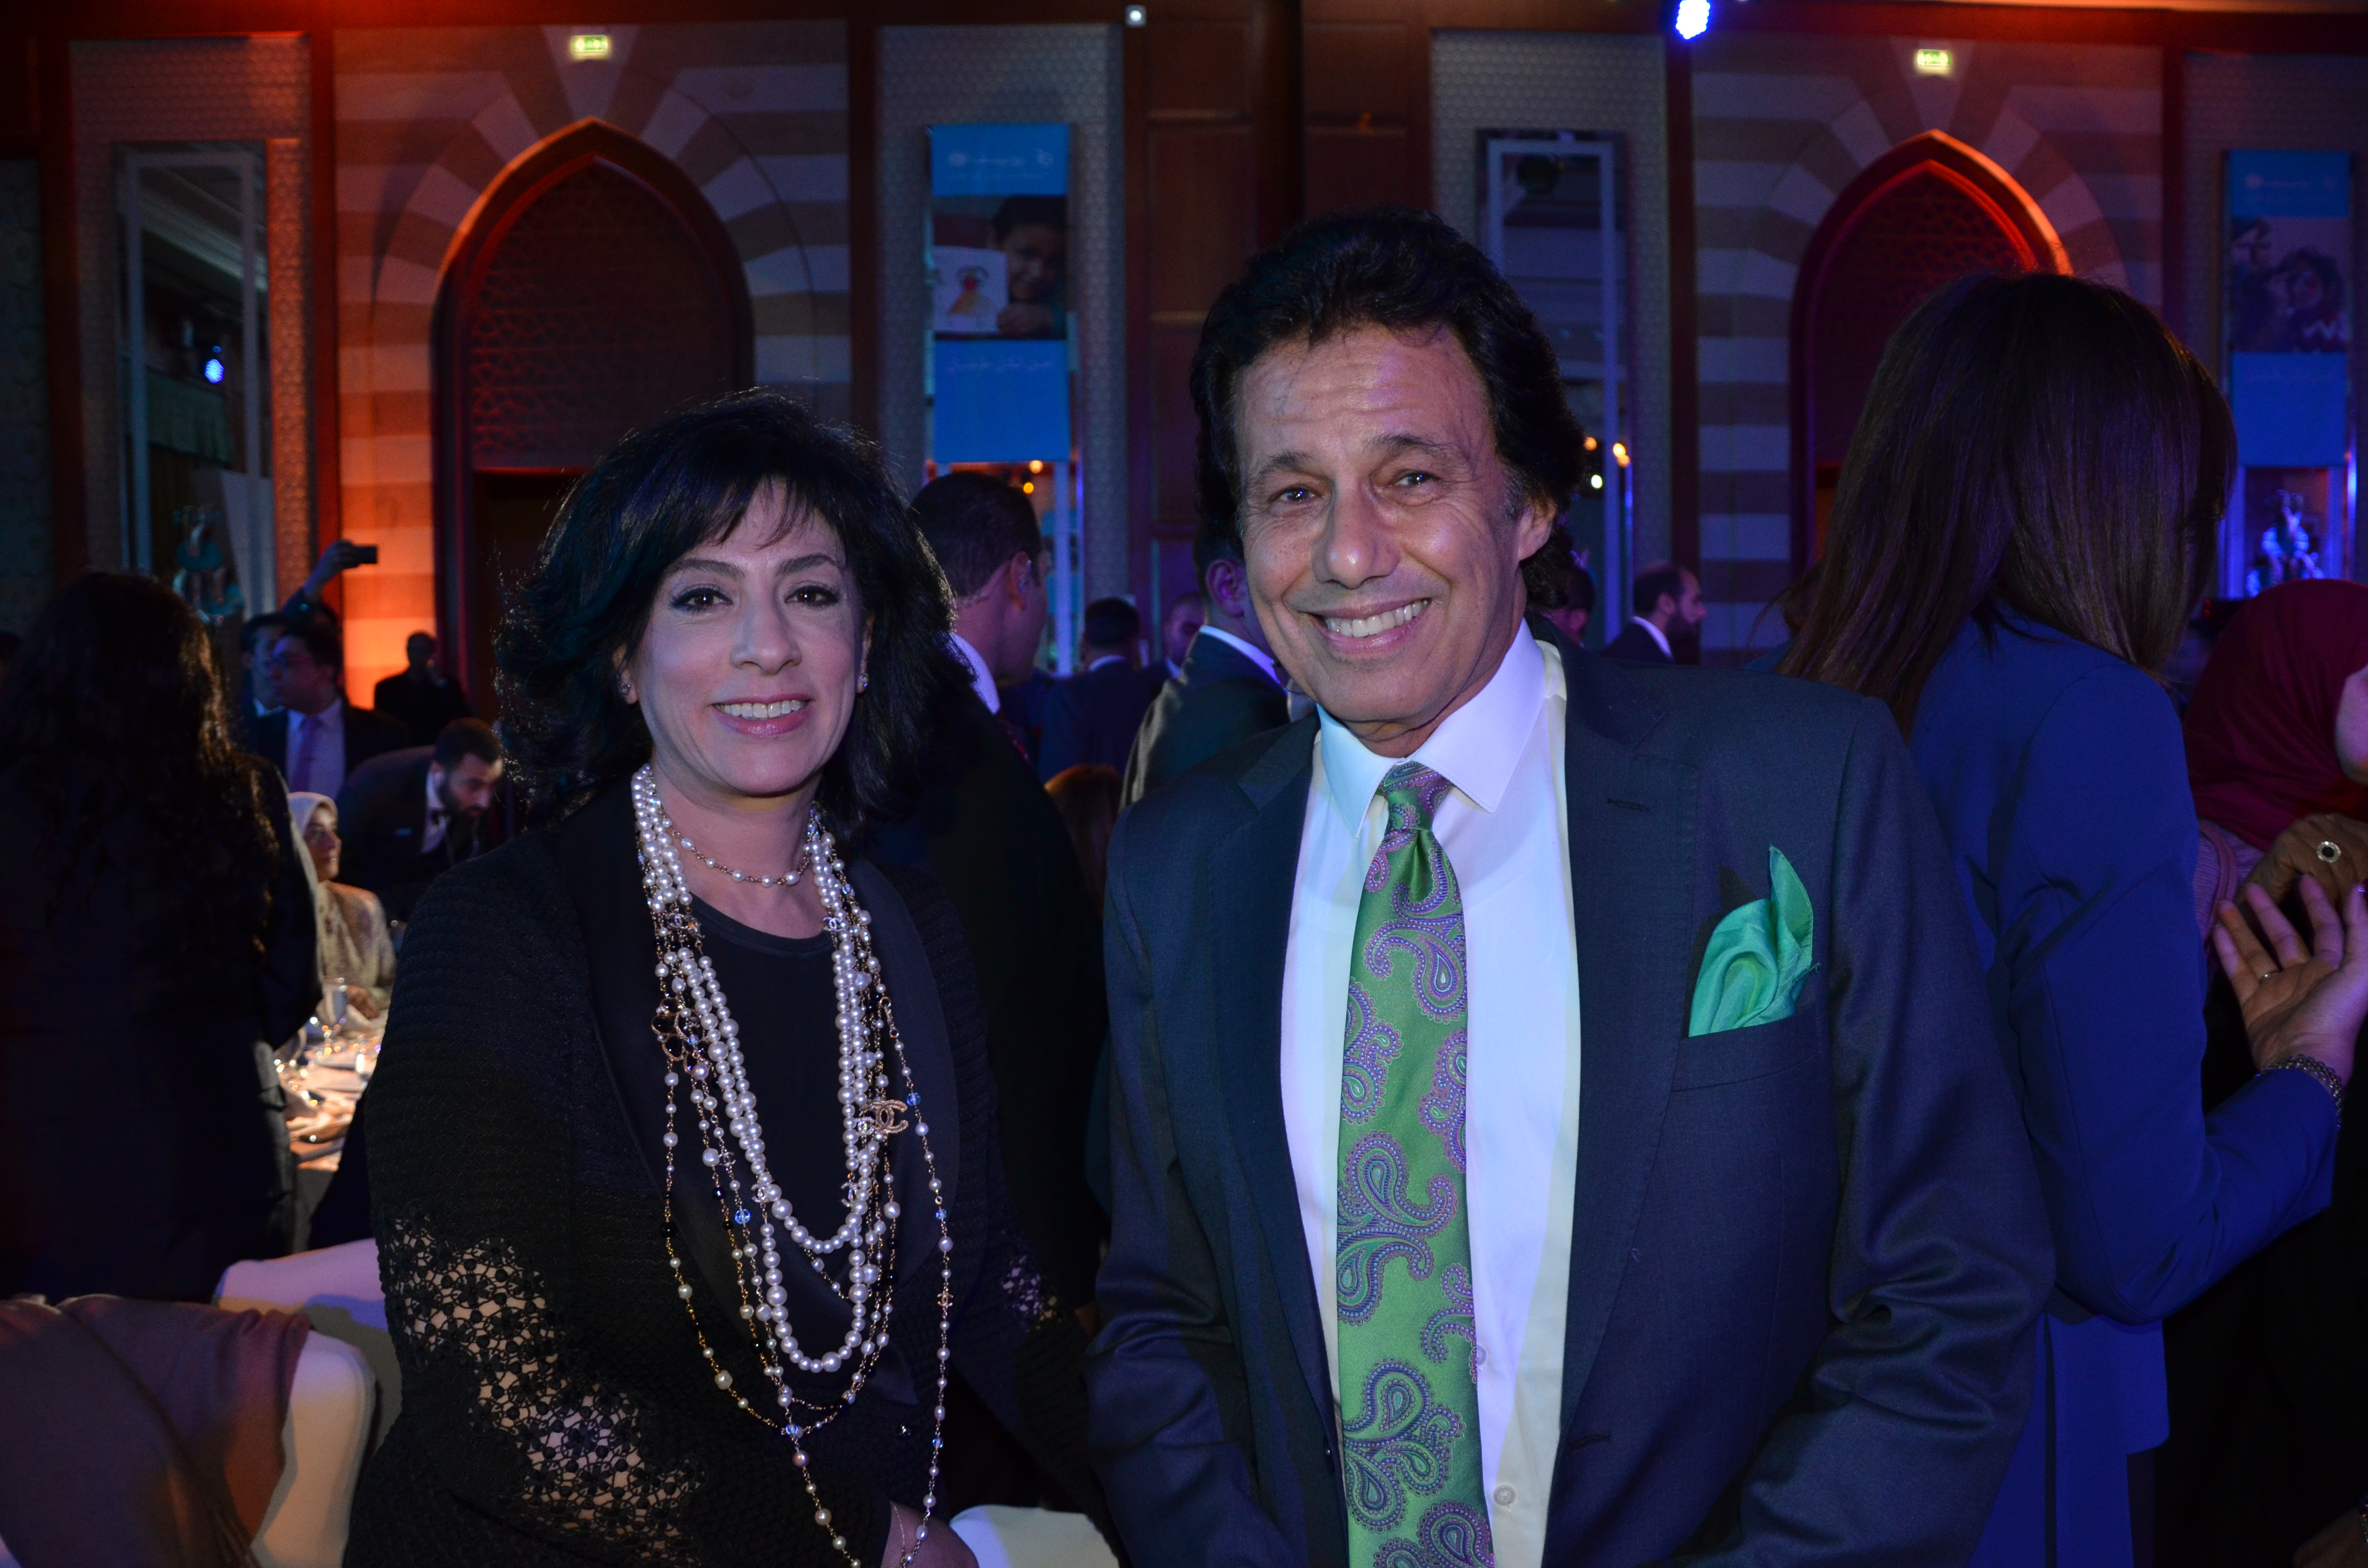 Ms. Randa Abul Azm & Mr. Ibrahim El-Kerdany